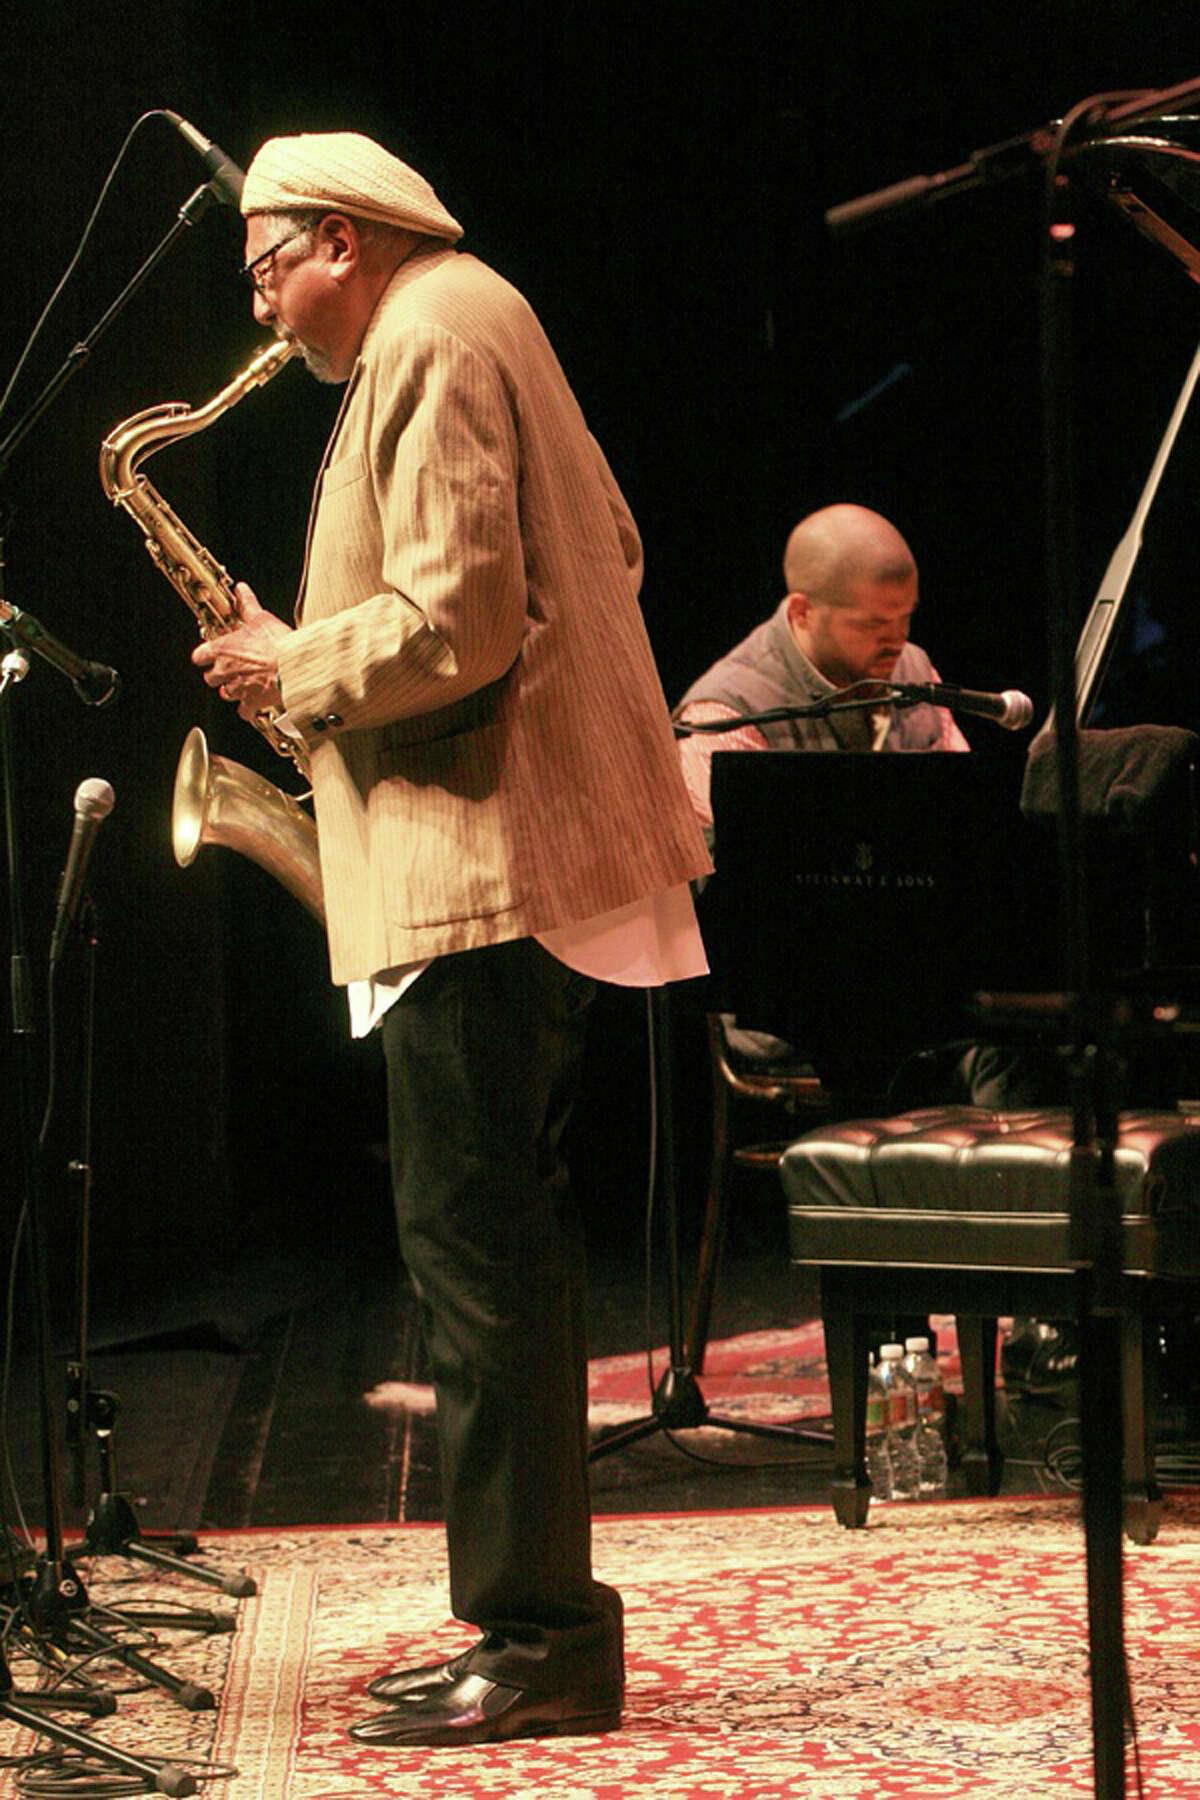 Jazz saxophonist Charles Lloyd and pianist Jason Moran performing for Da Camera of Houston